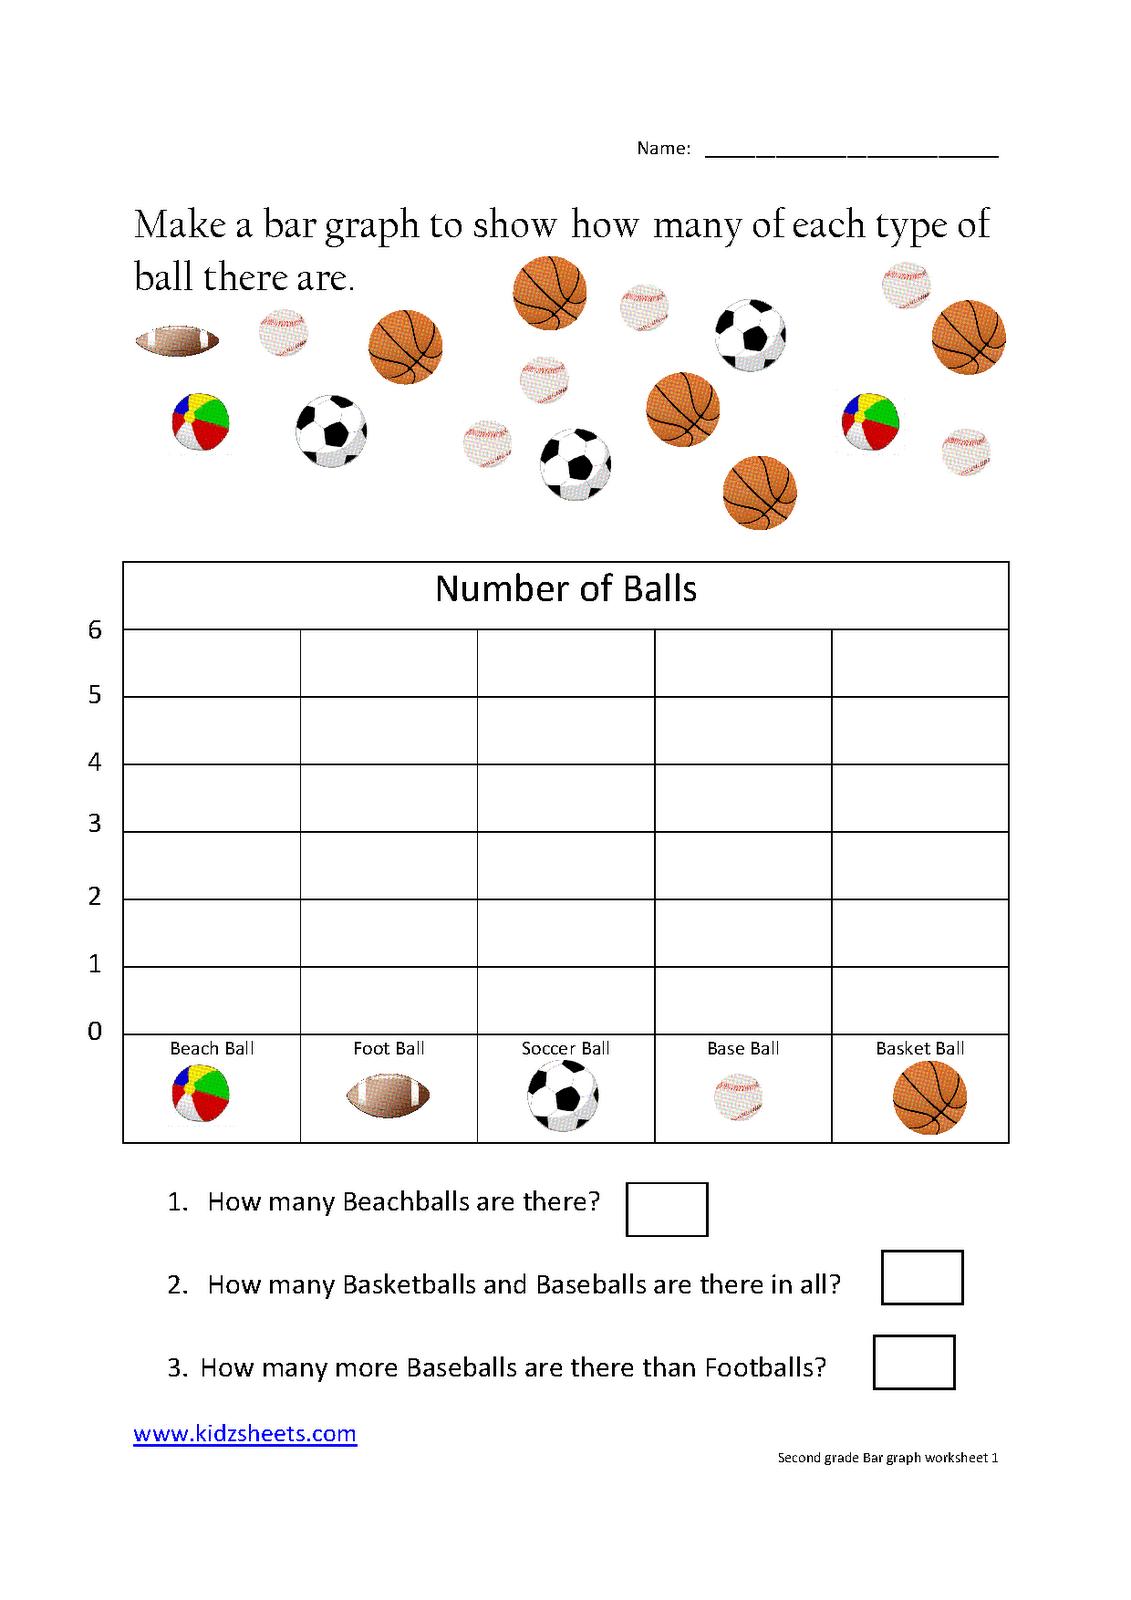 hight resolution of Kidz Worksheets: Second Grade Bar Graph Worksheet1   Education on Best  Worksheets Collection 3463